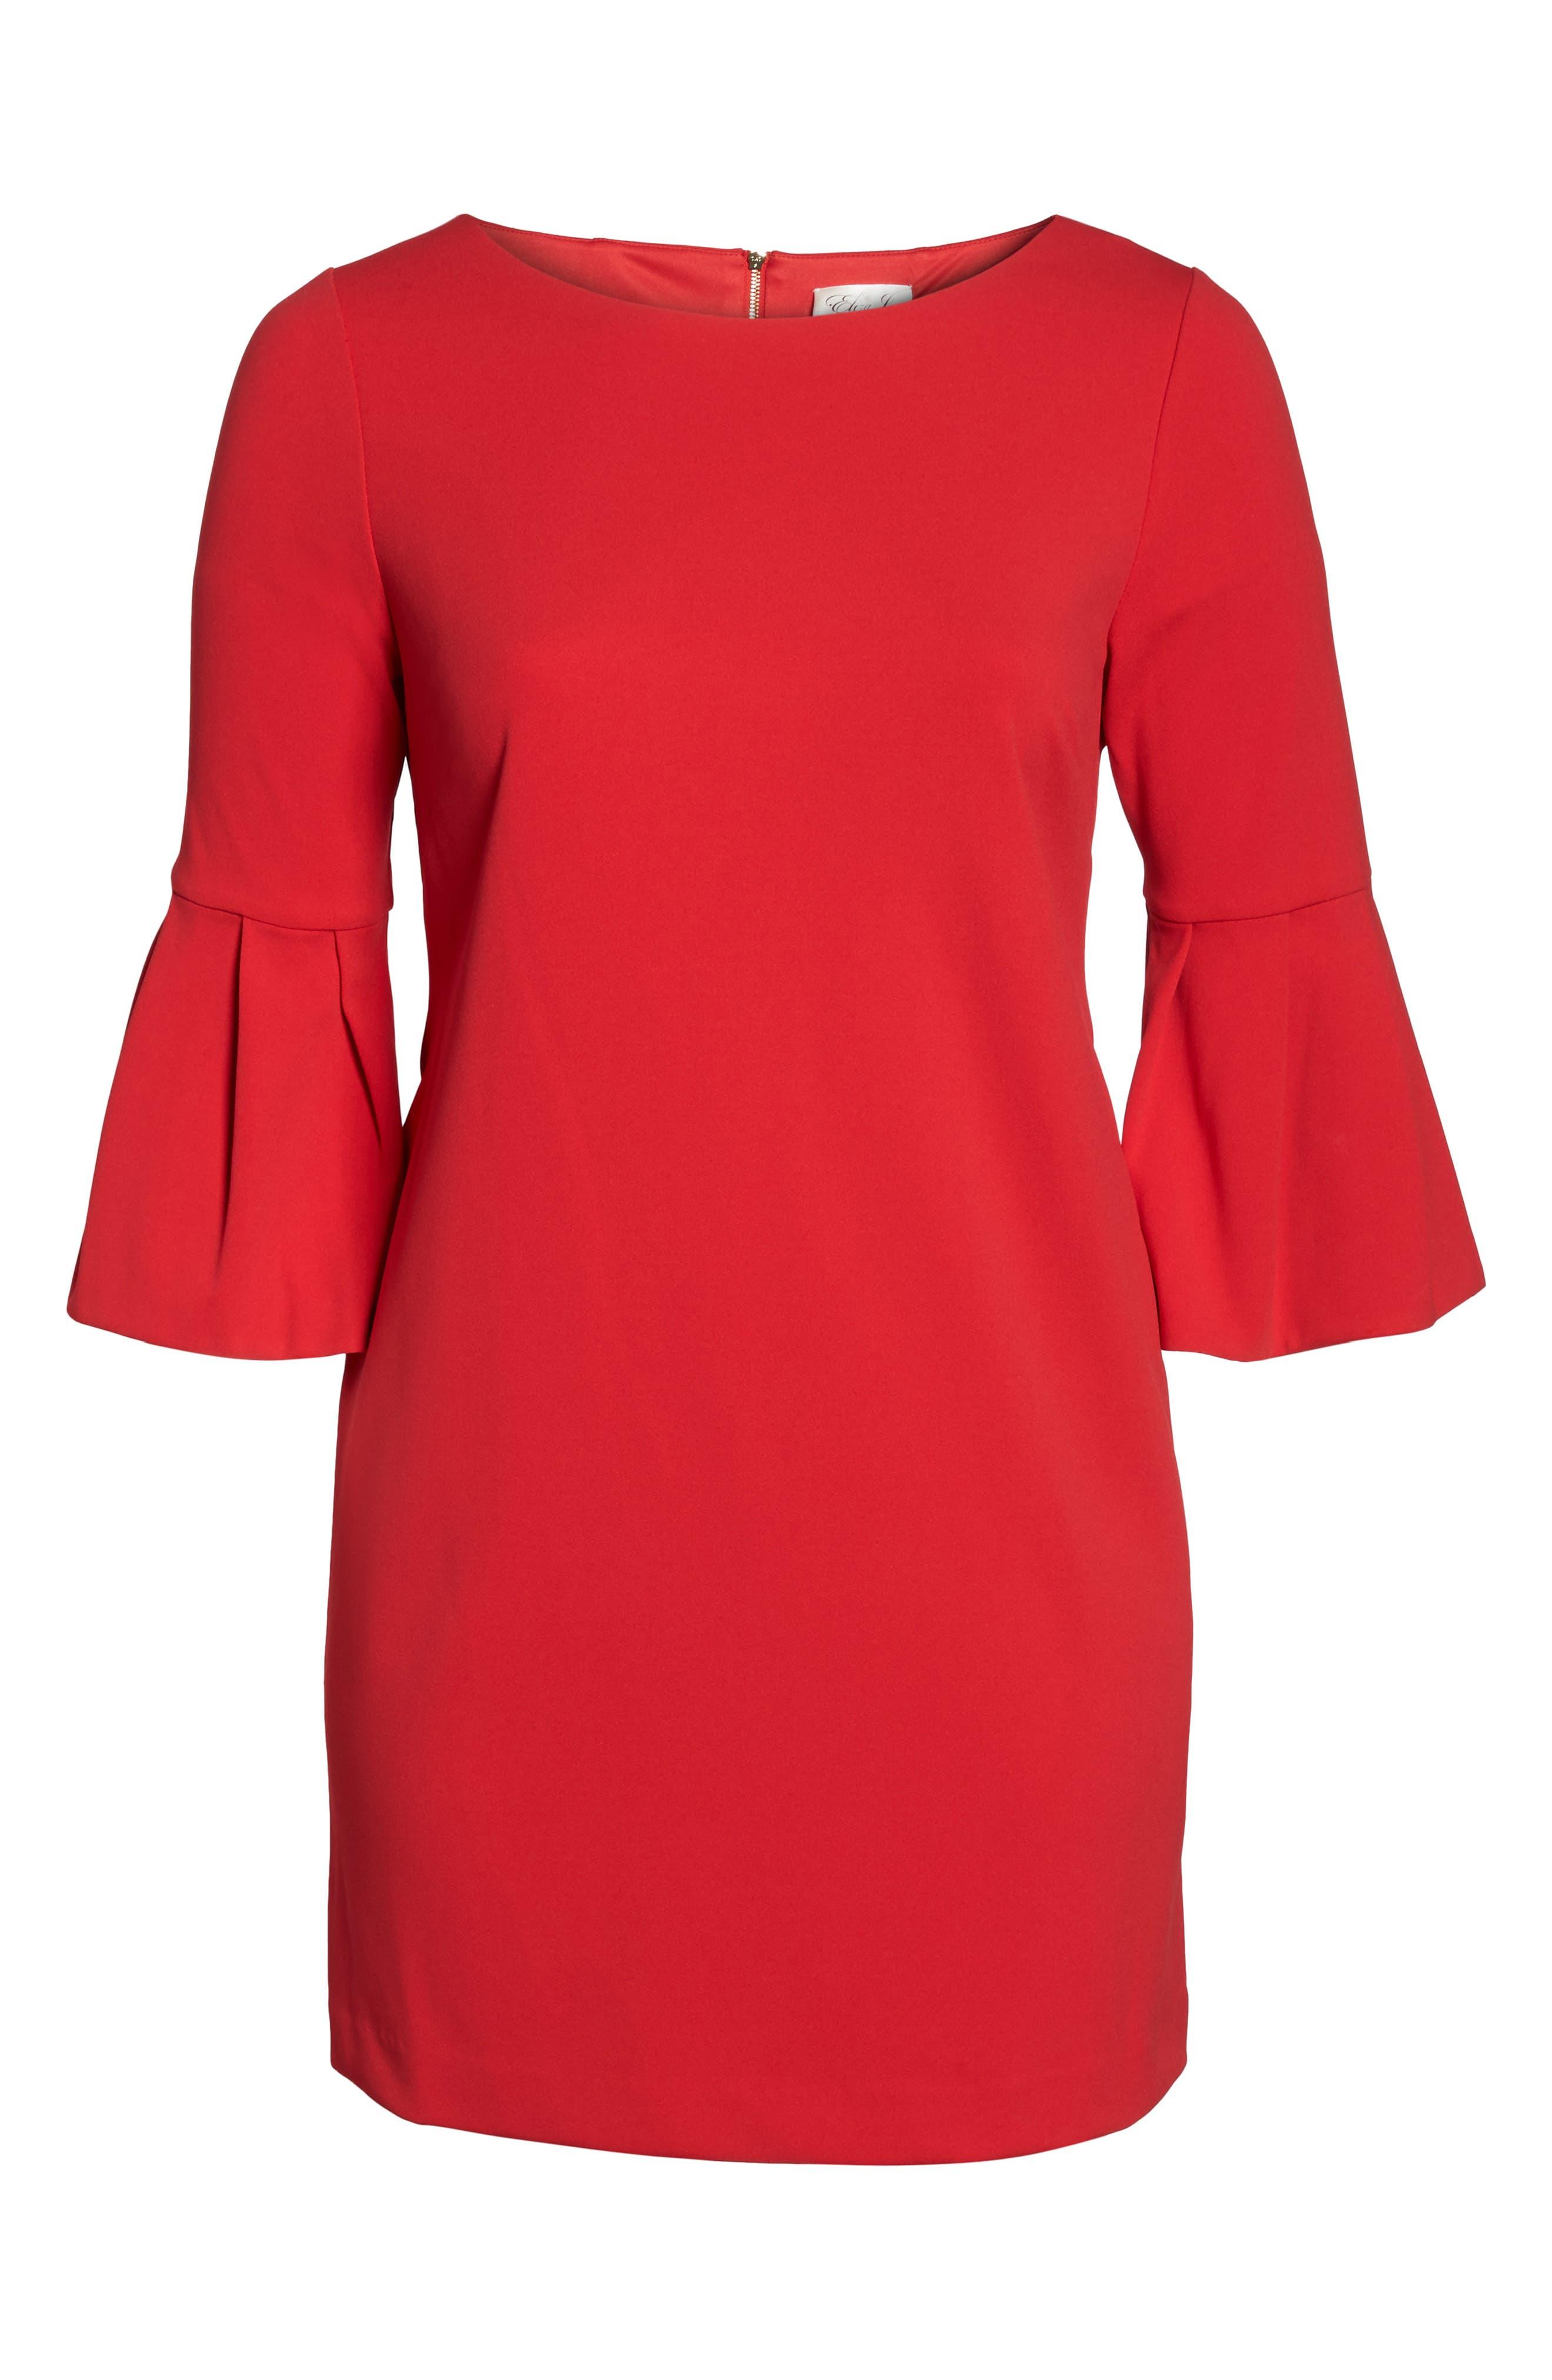 Bell Sleeve Shift Dress,                             Alternate thumbnail 5, color,                             Red